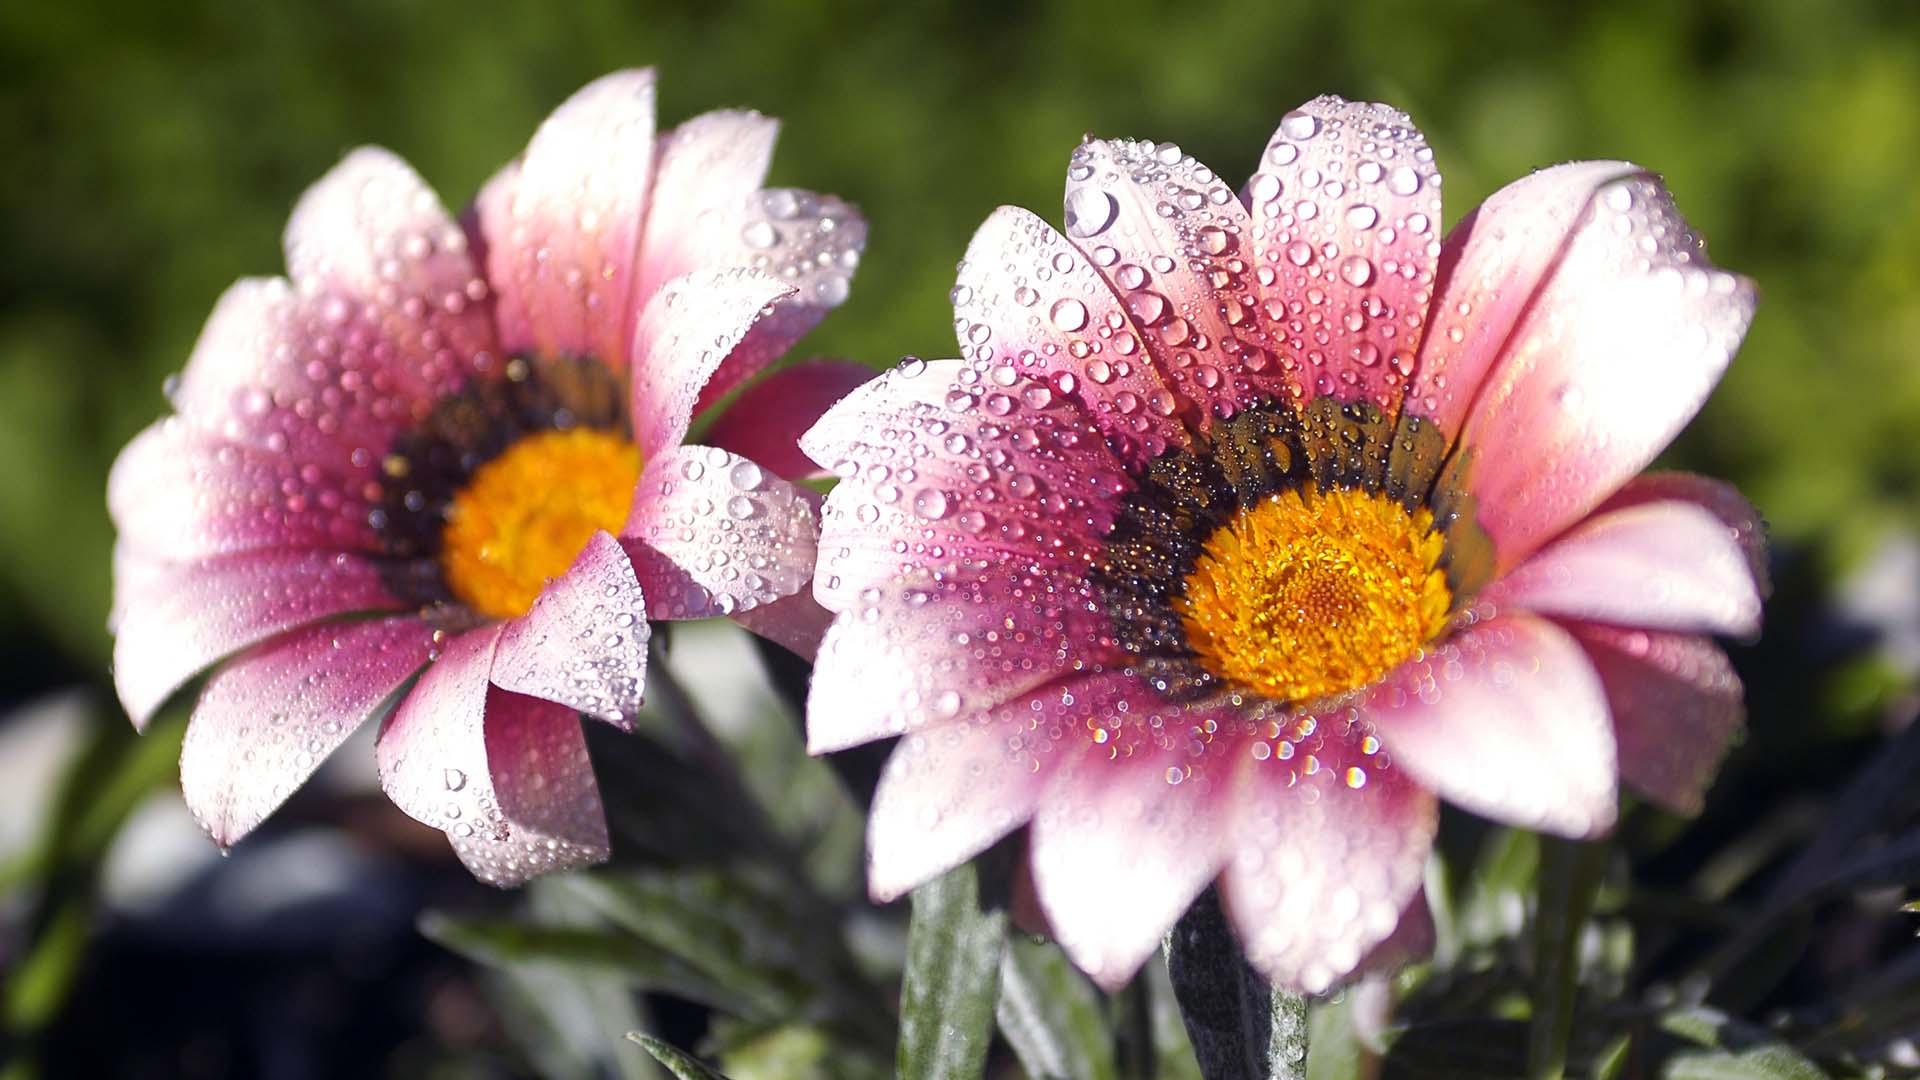 african daisy flowers wallpaper desktop image free download